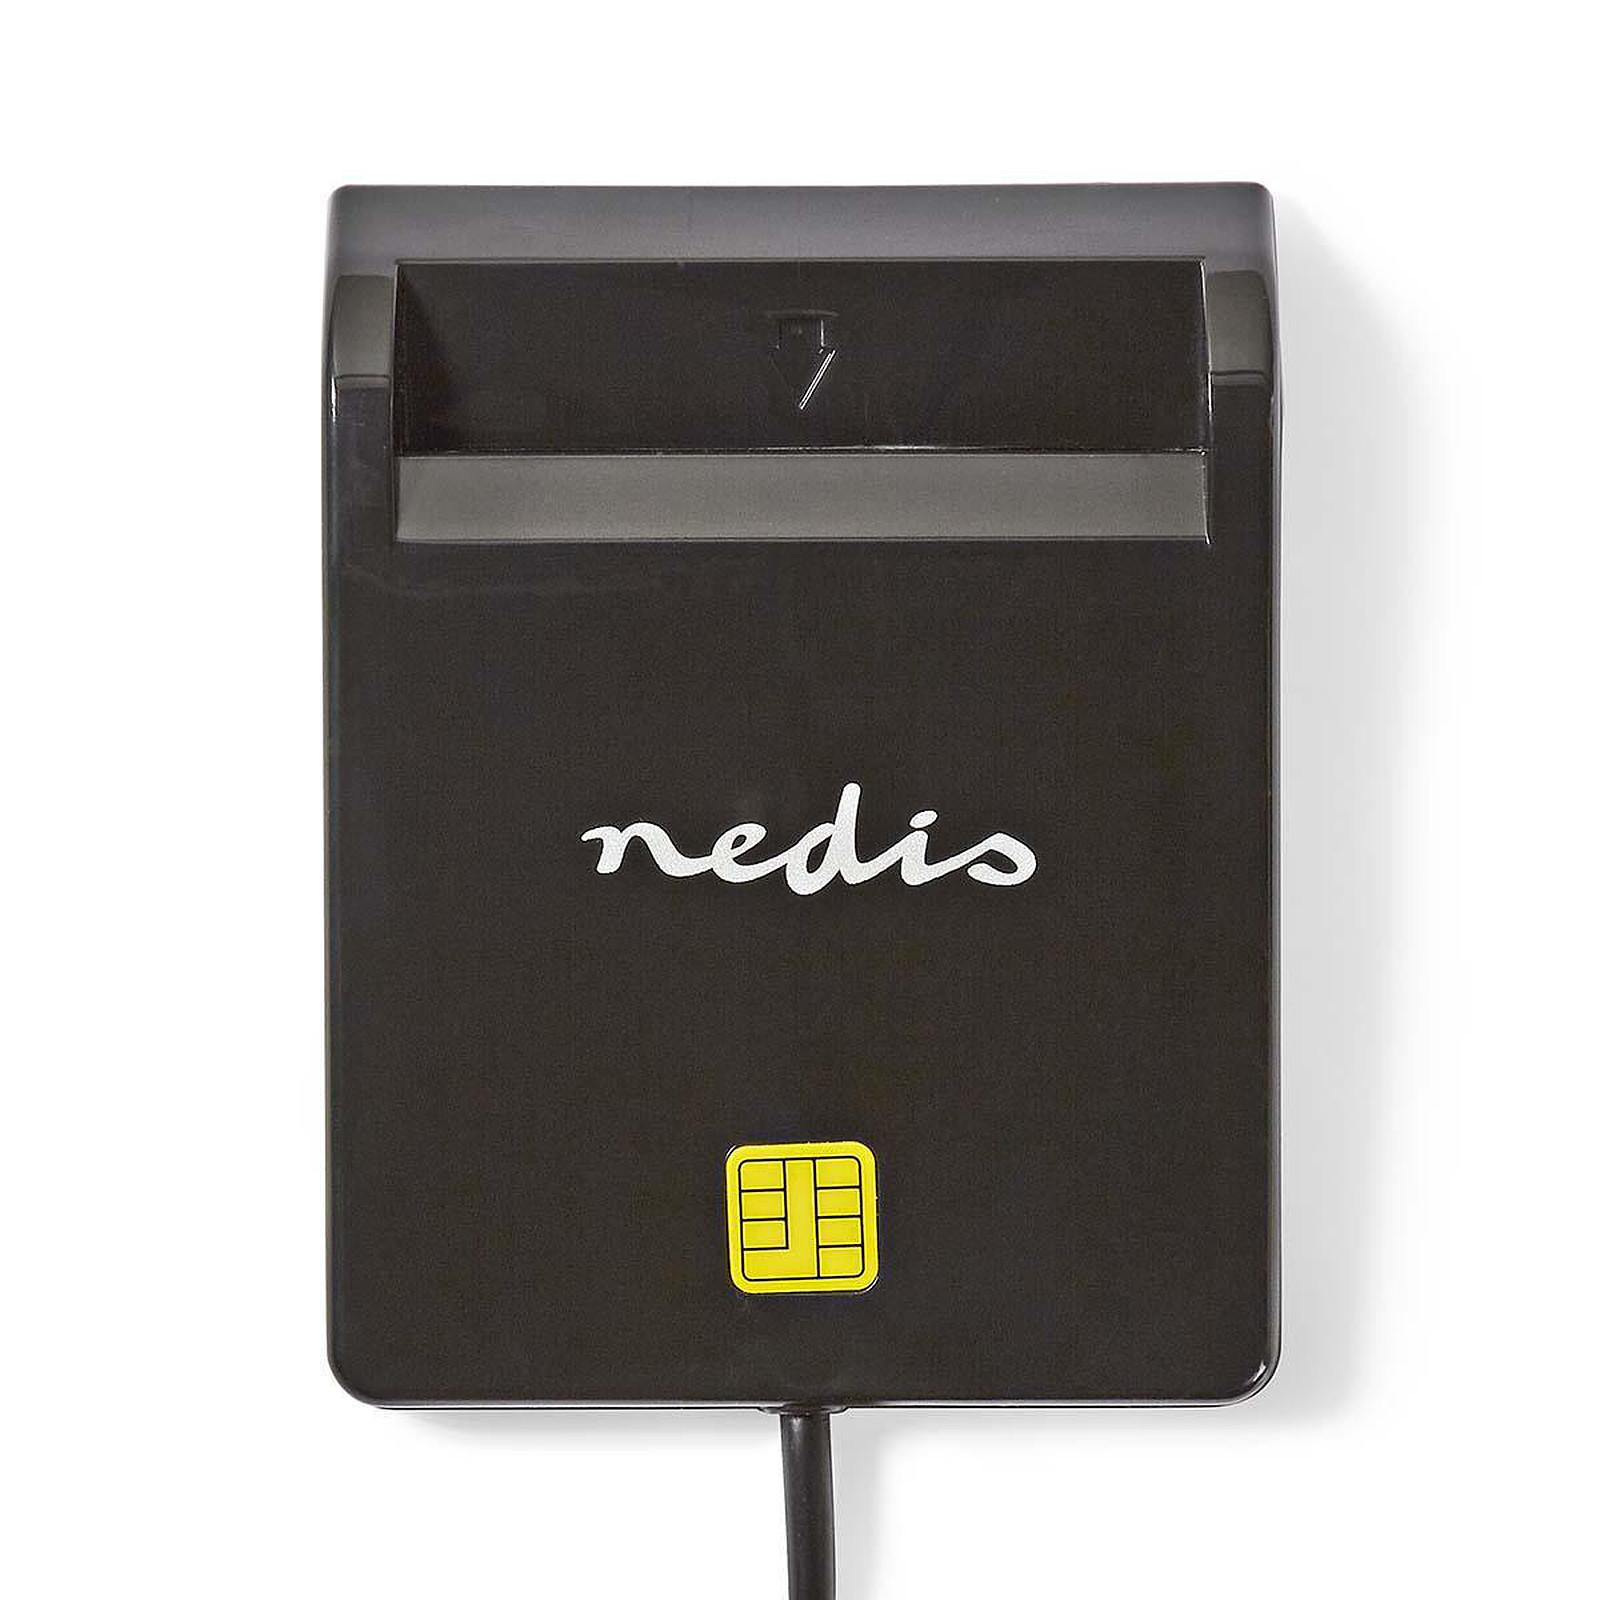 Nedis Lecteur de carte à puce horizontal (CRDRU2SM2BK)